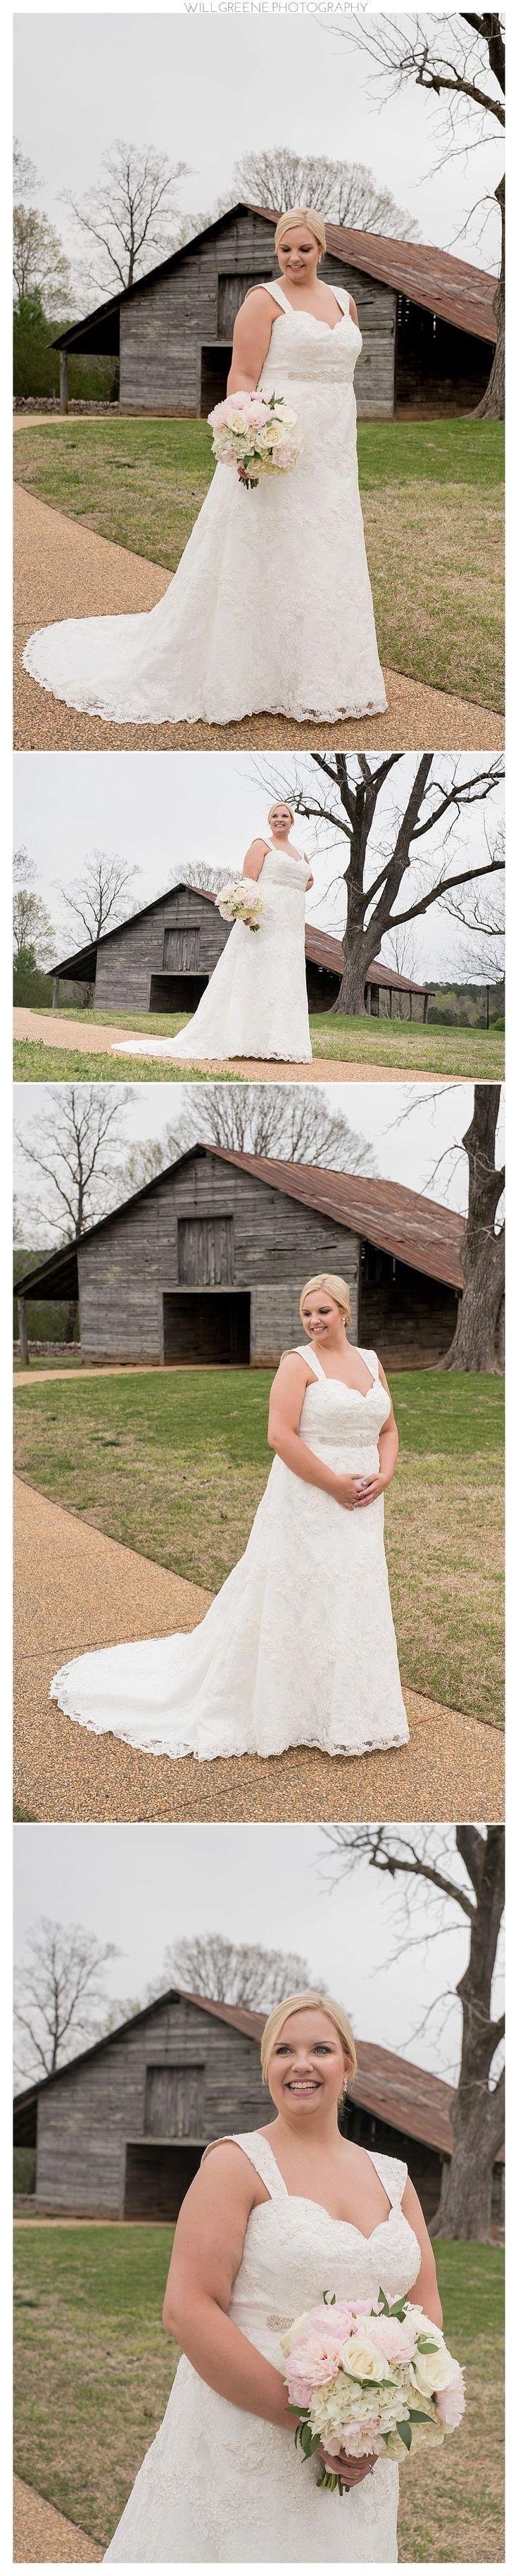 Katie's E. Carroll Joyner Park bridal session, Wake Forest NC, Will Greene Photography